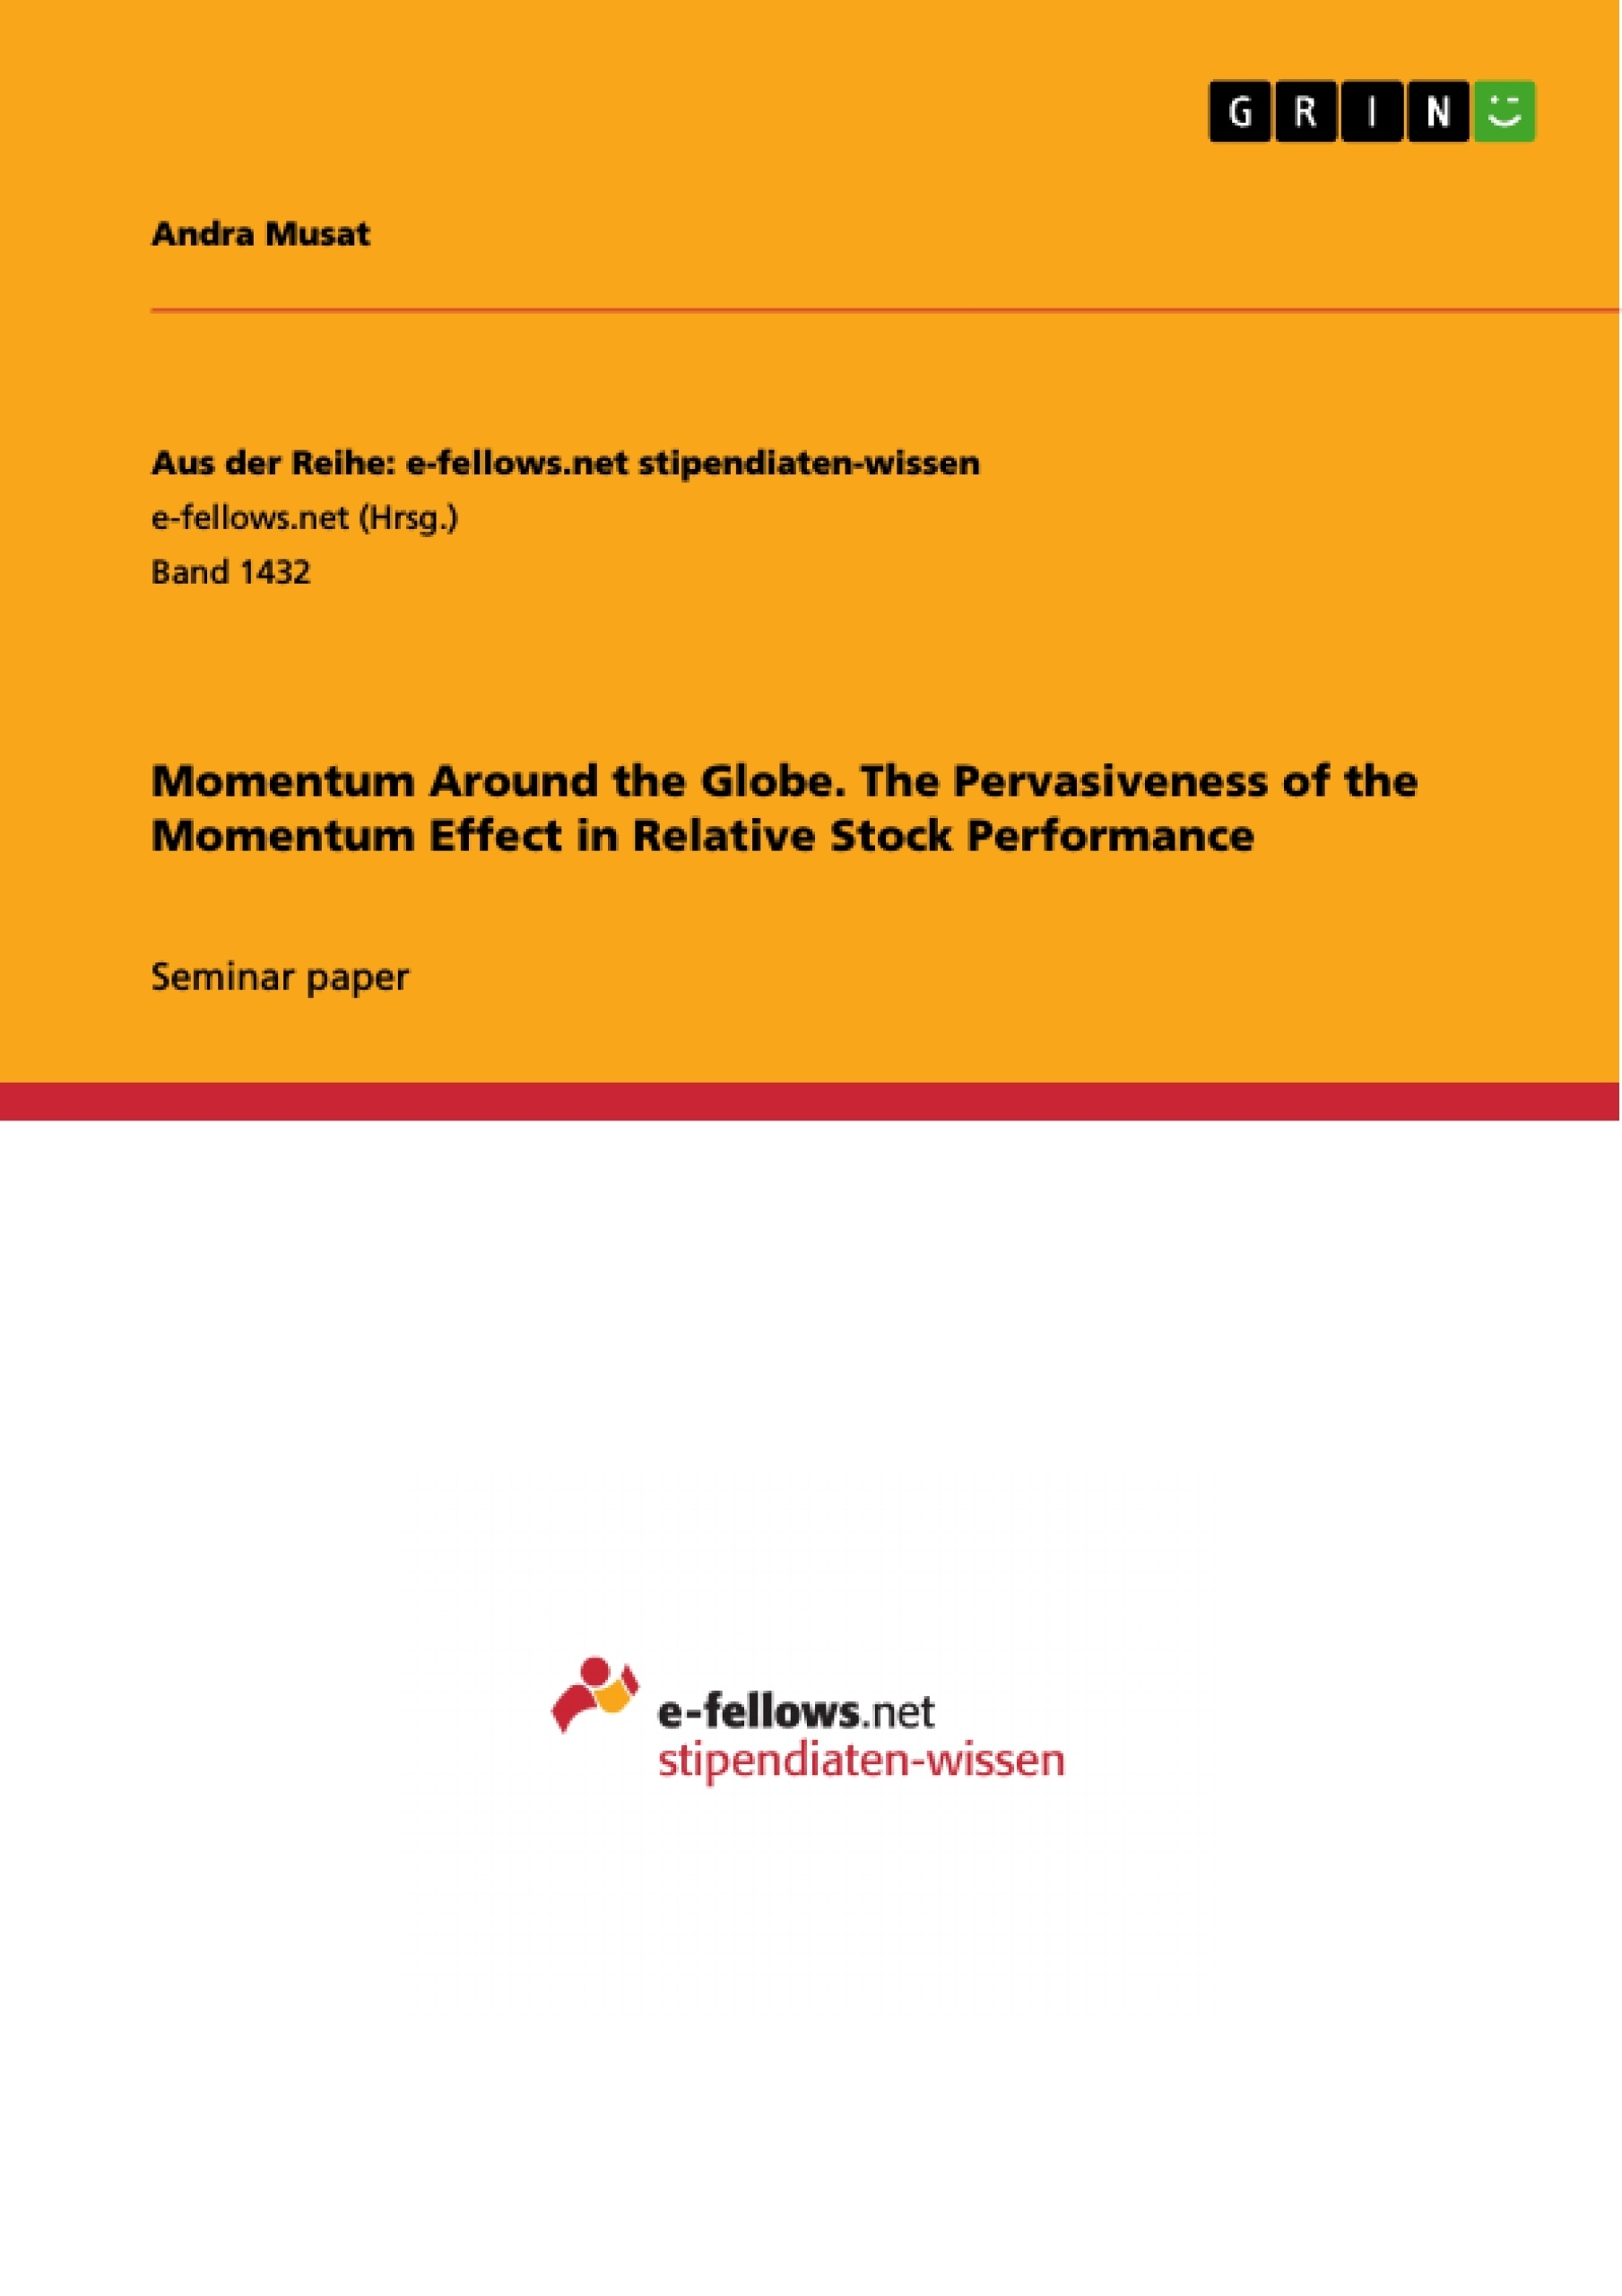 Title: Momentum Around the Globe. The Pervasiveness of the Momentum Effect in Relative Stock Performance